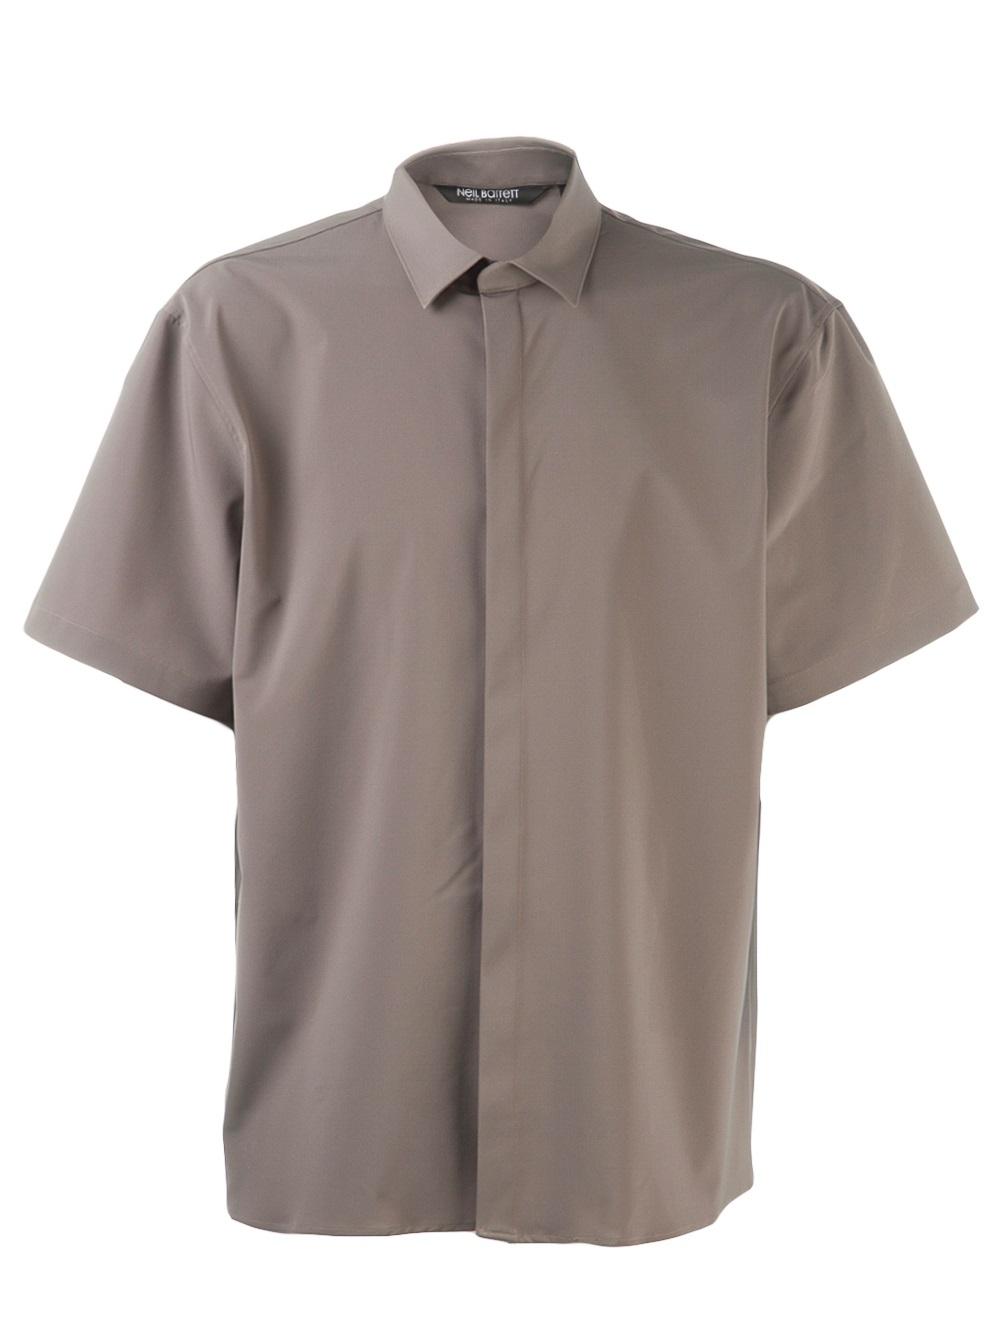 Neil barrett short sleeve button down shirt in gray for for Mens grey button down dress shirt